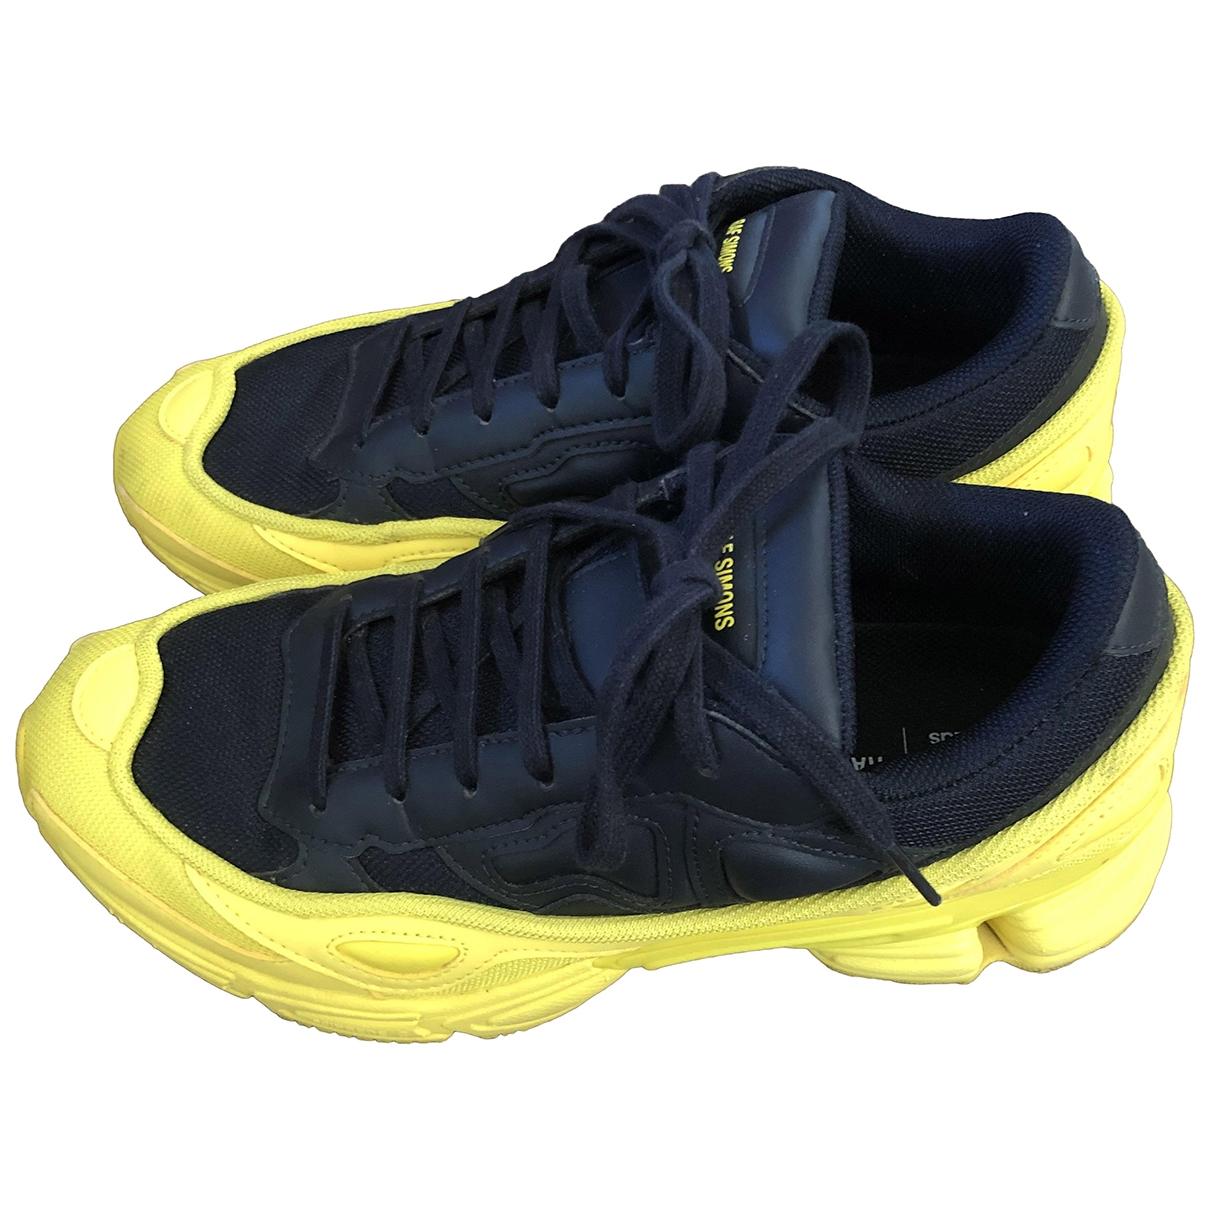 Adidas X Raf Simons Ozweego 2 Trainers for Women 7.5 US